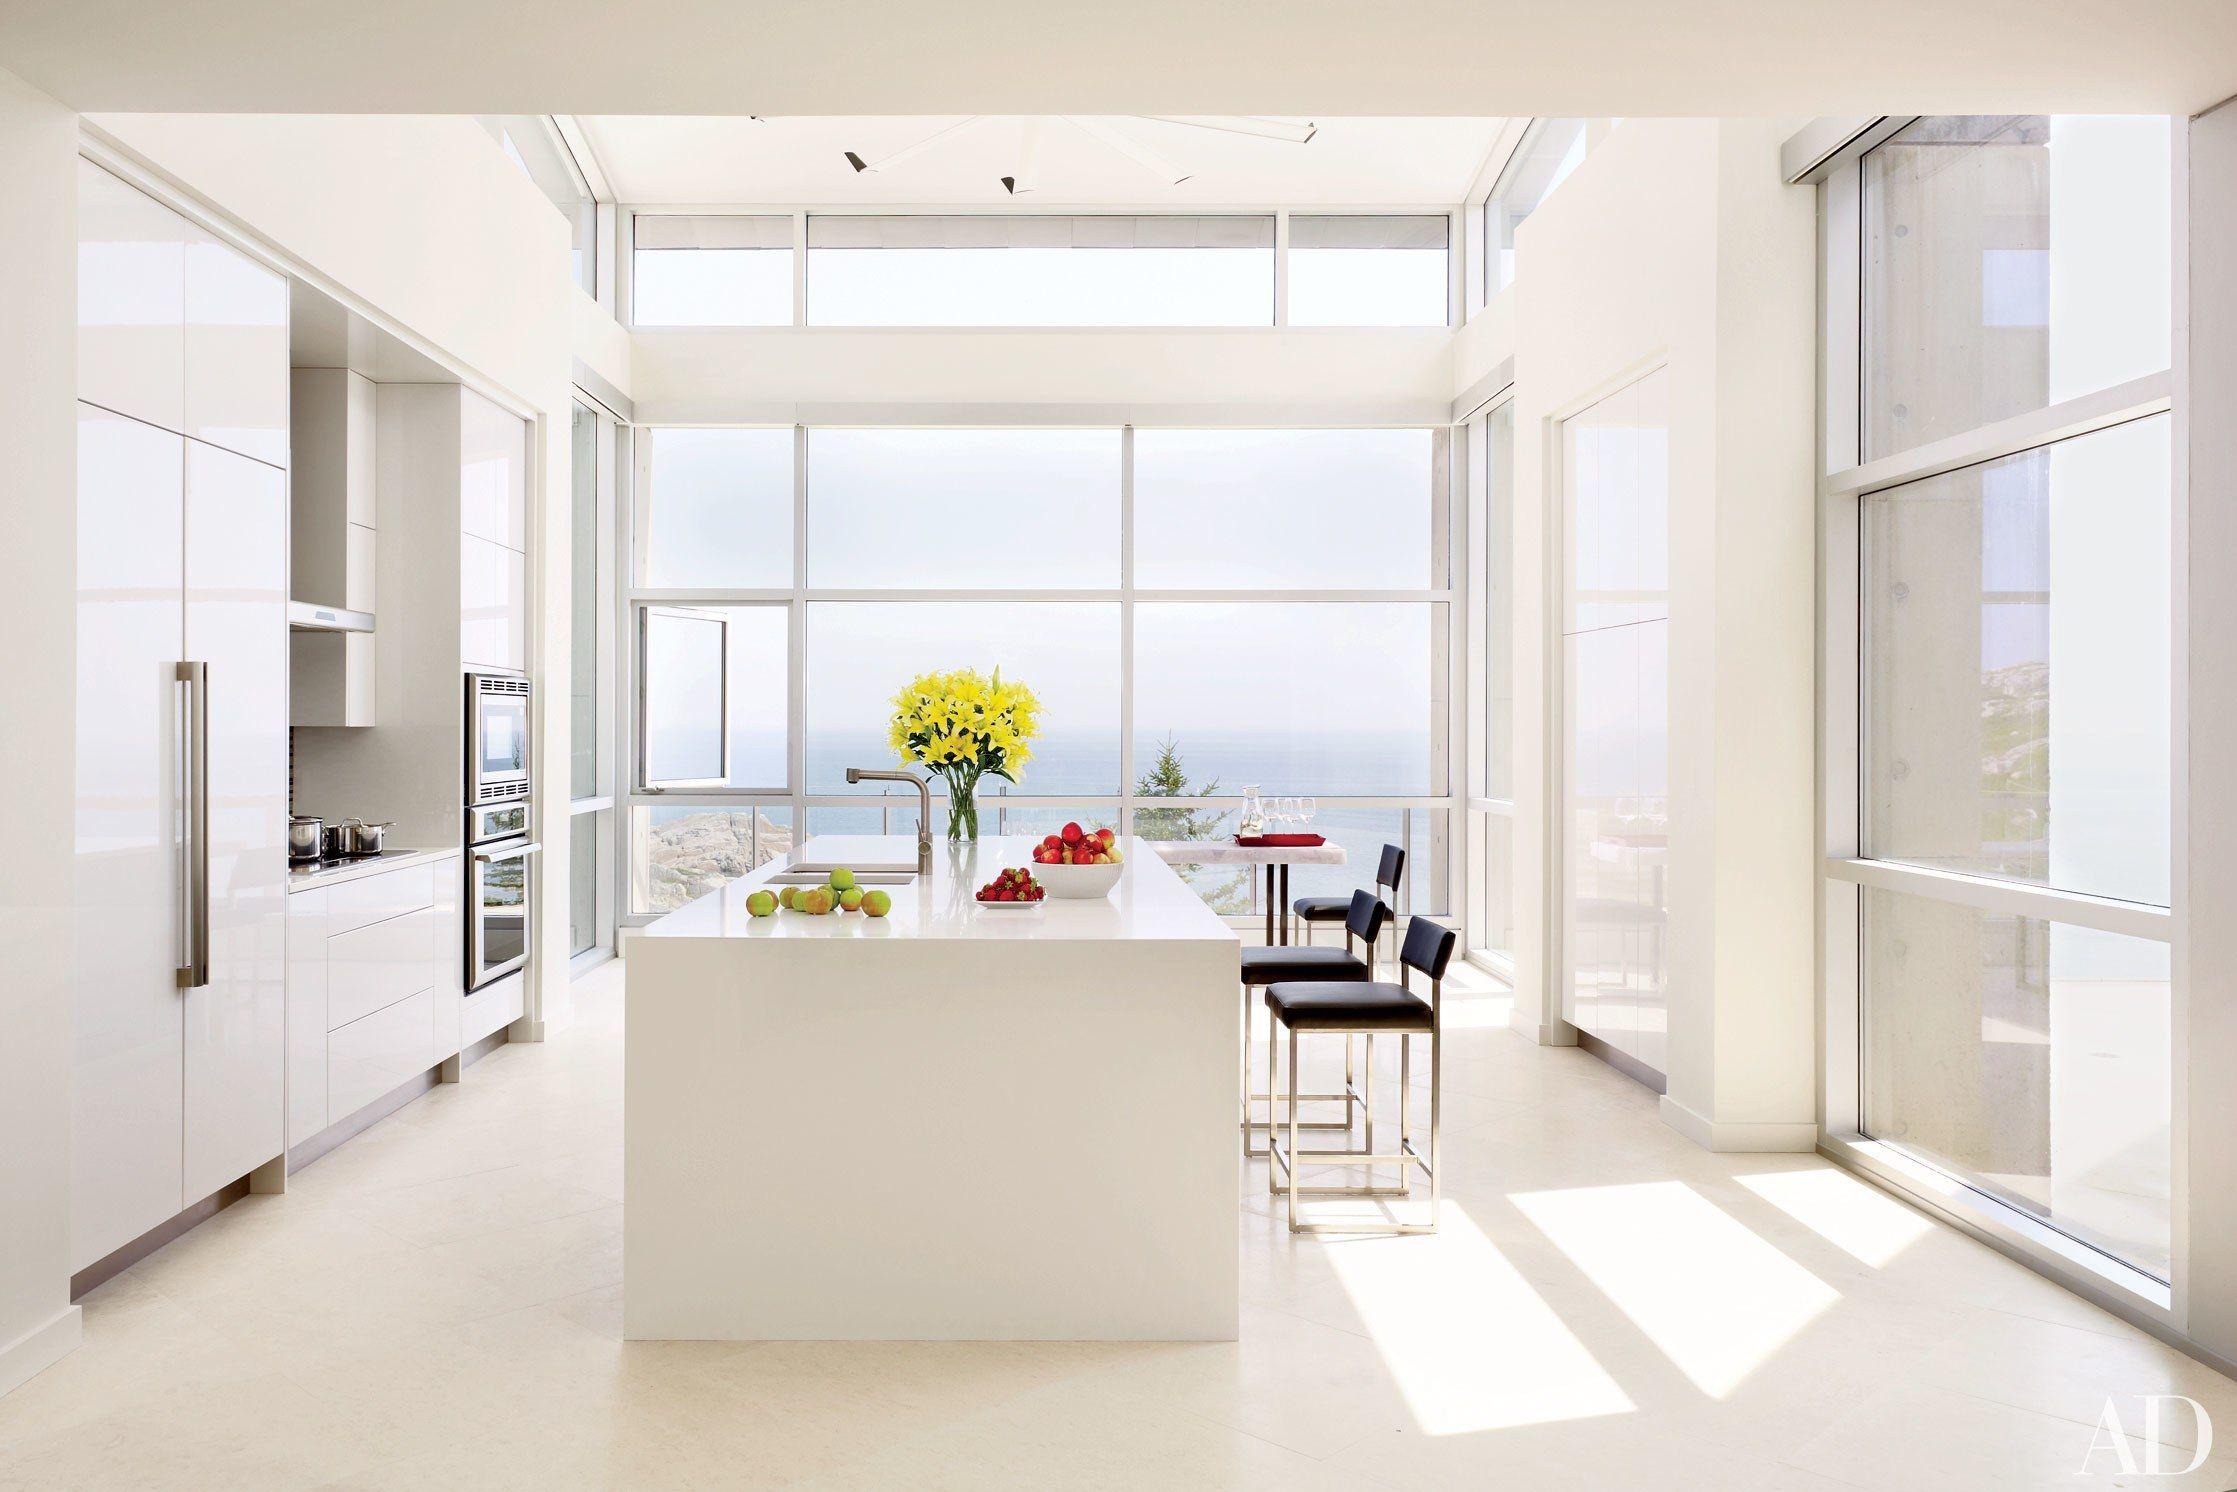 White Kitchens Design Ideas | Blanco y Cocinas